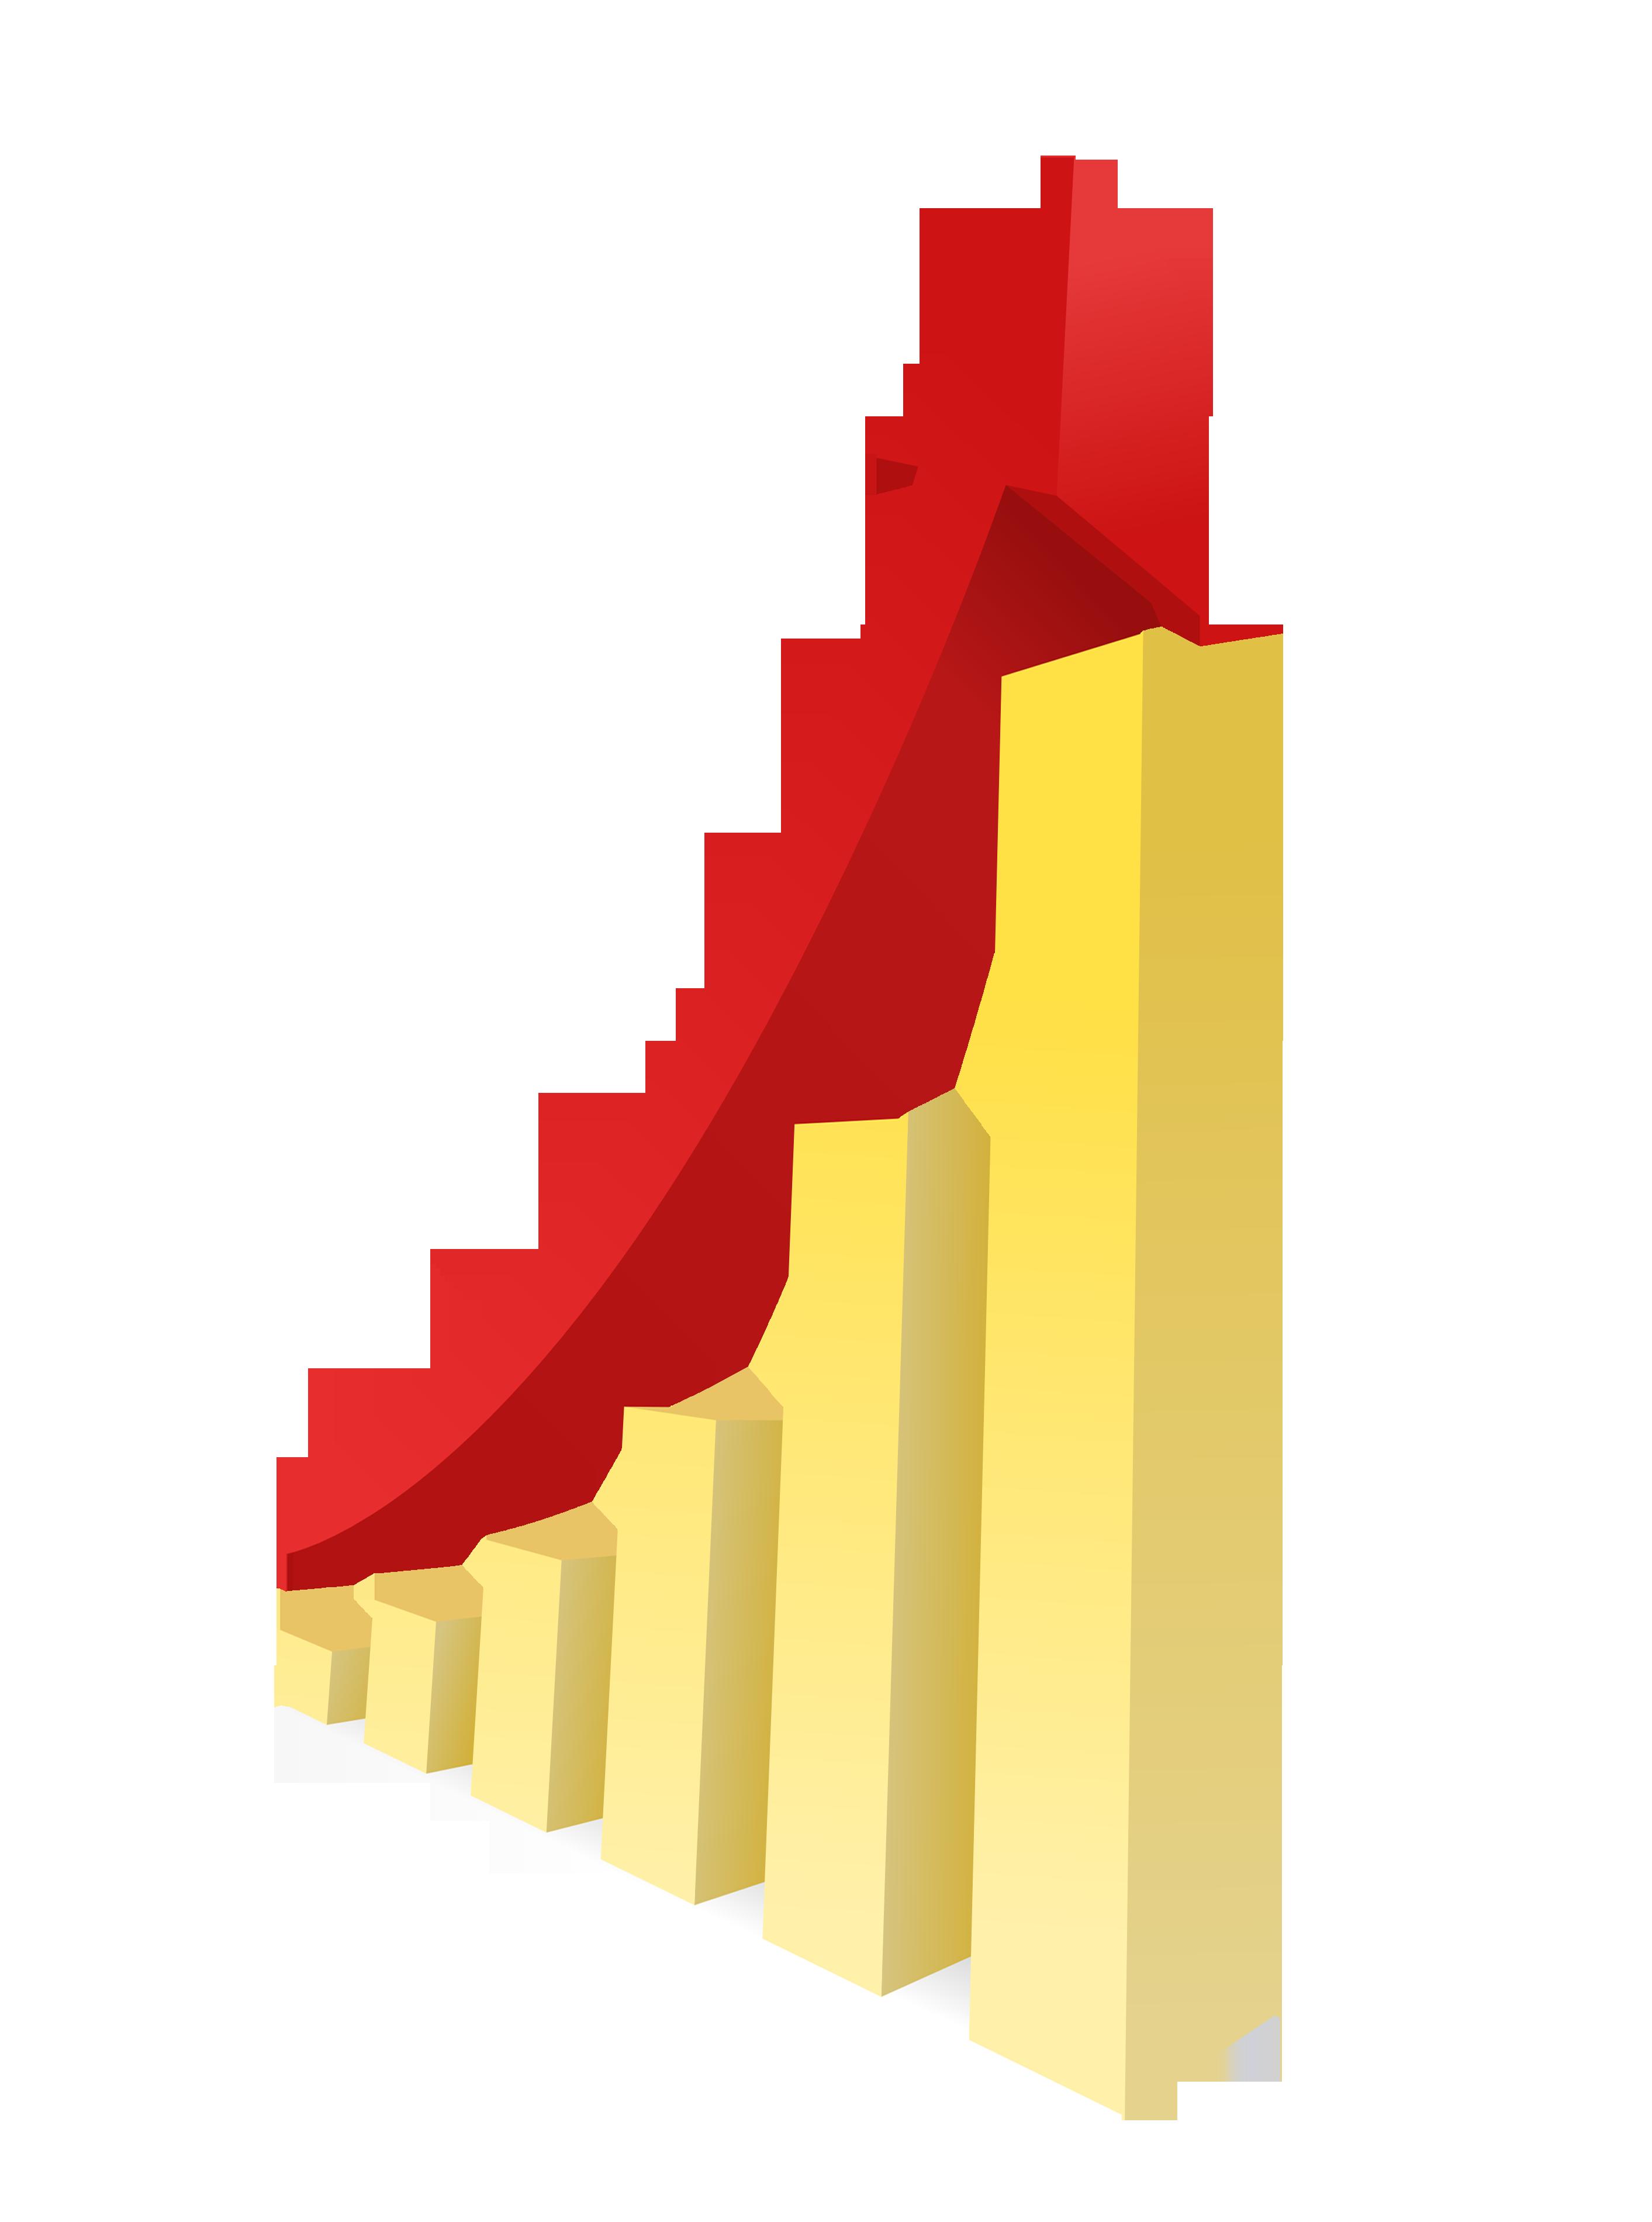 Share free trail multibagger. Graph clipart stock market graph